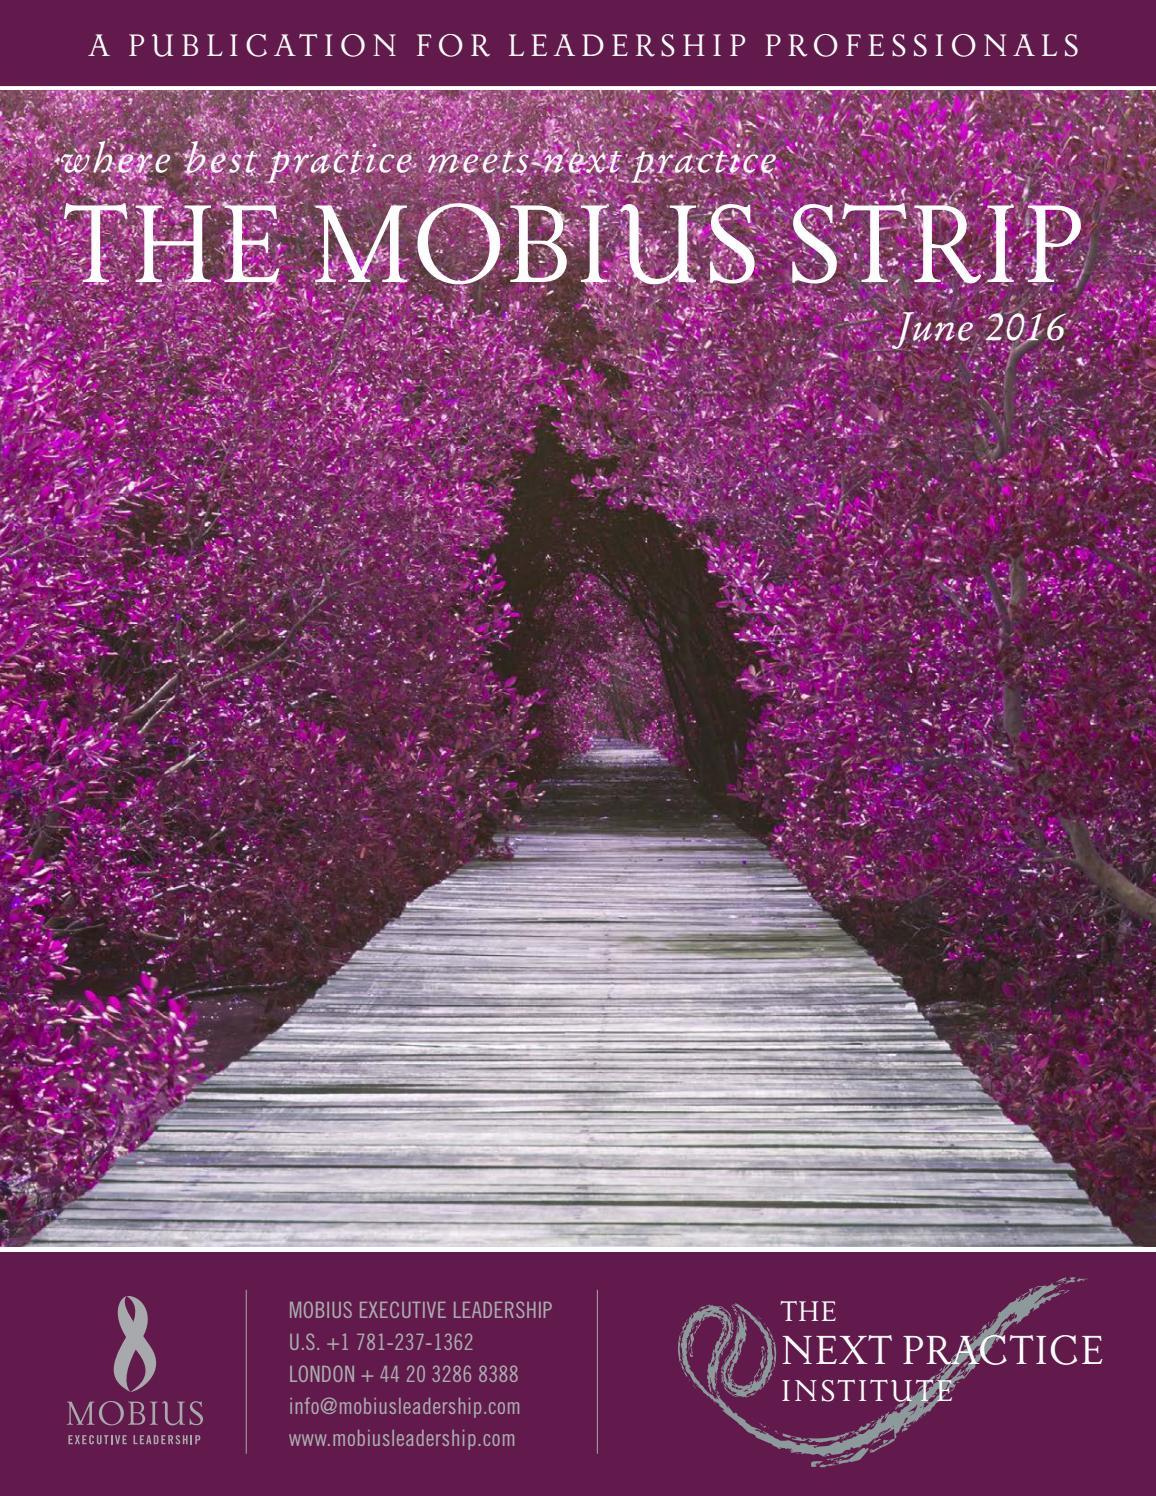 Mobius strip june 2016 by mobius executive leadership issuu izmirmasajfo